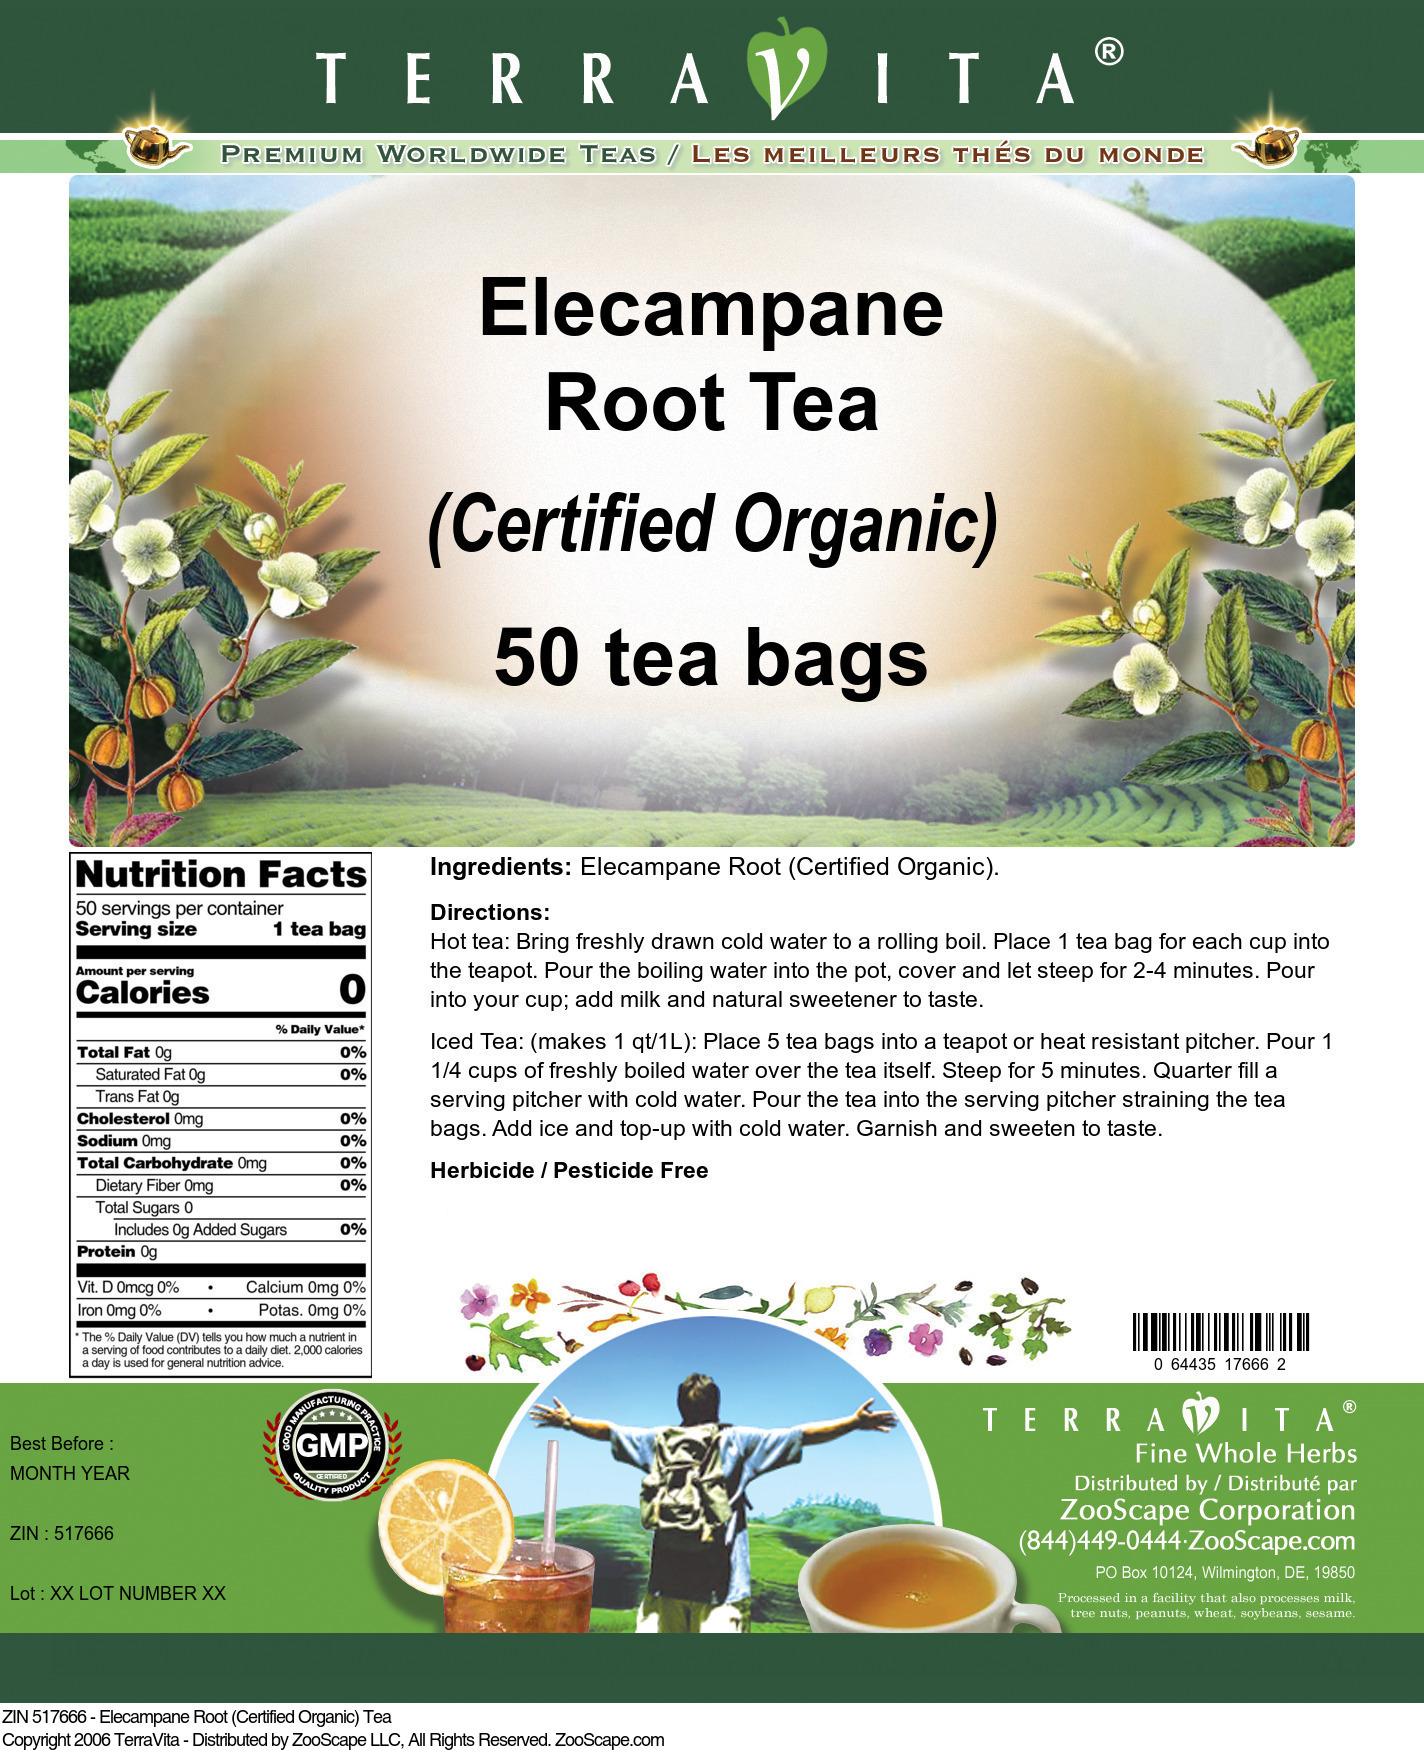 Elecampane Root (Certified Organic) Tea